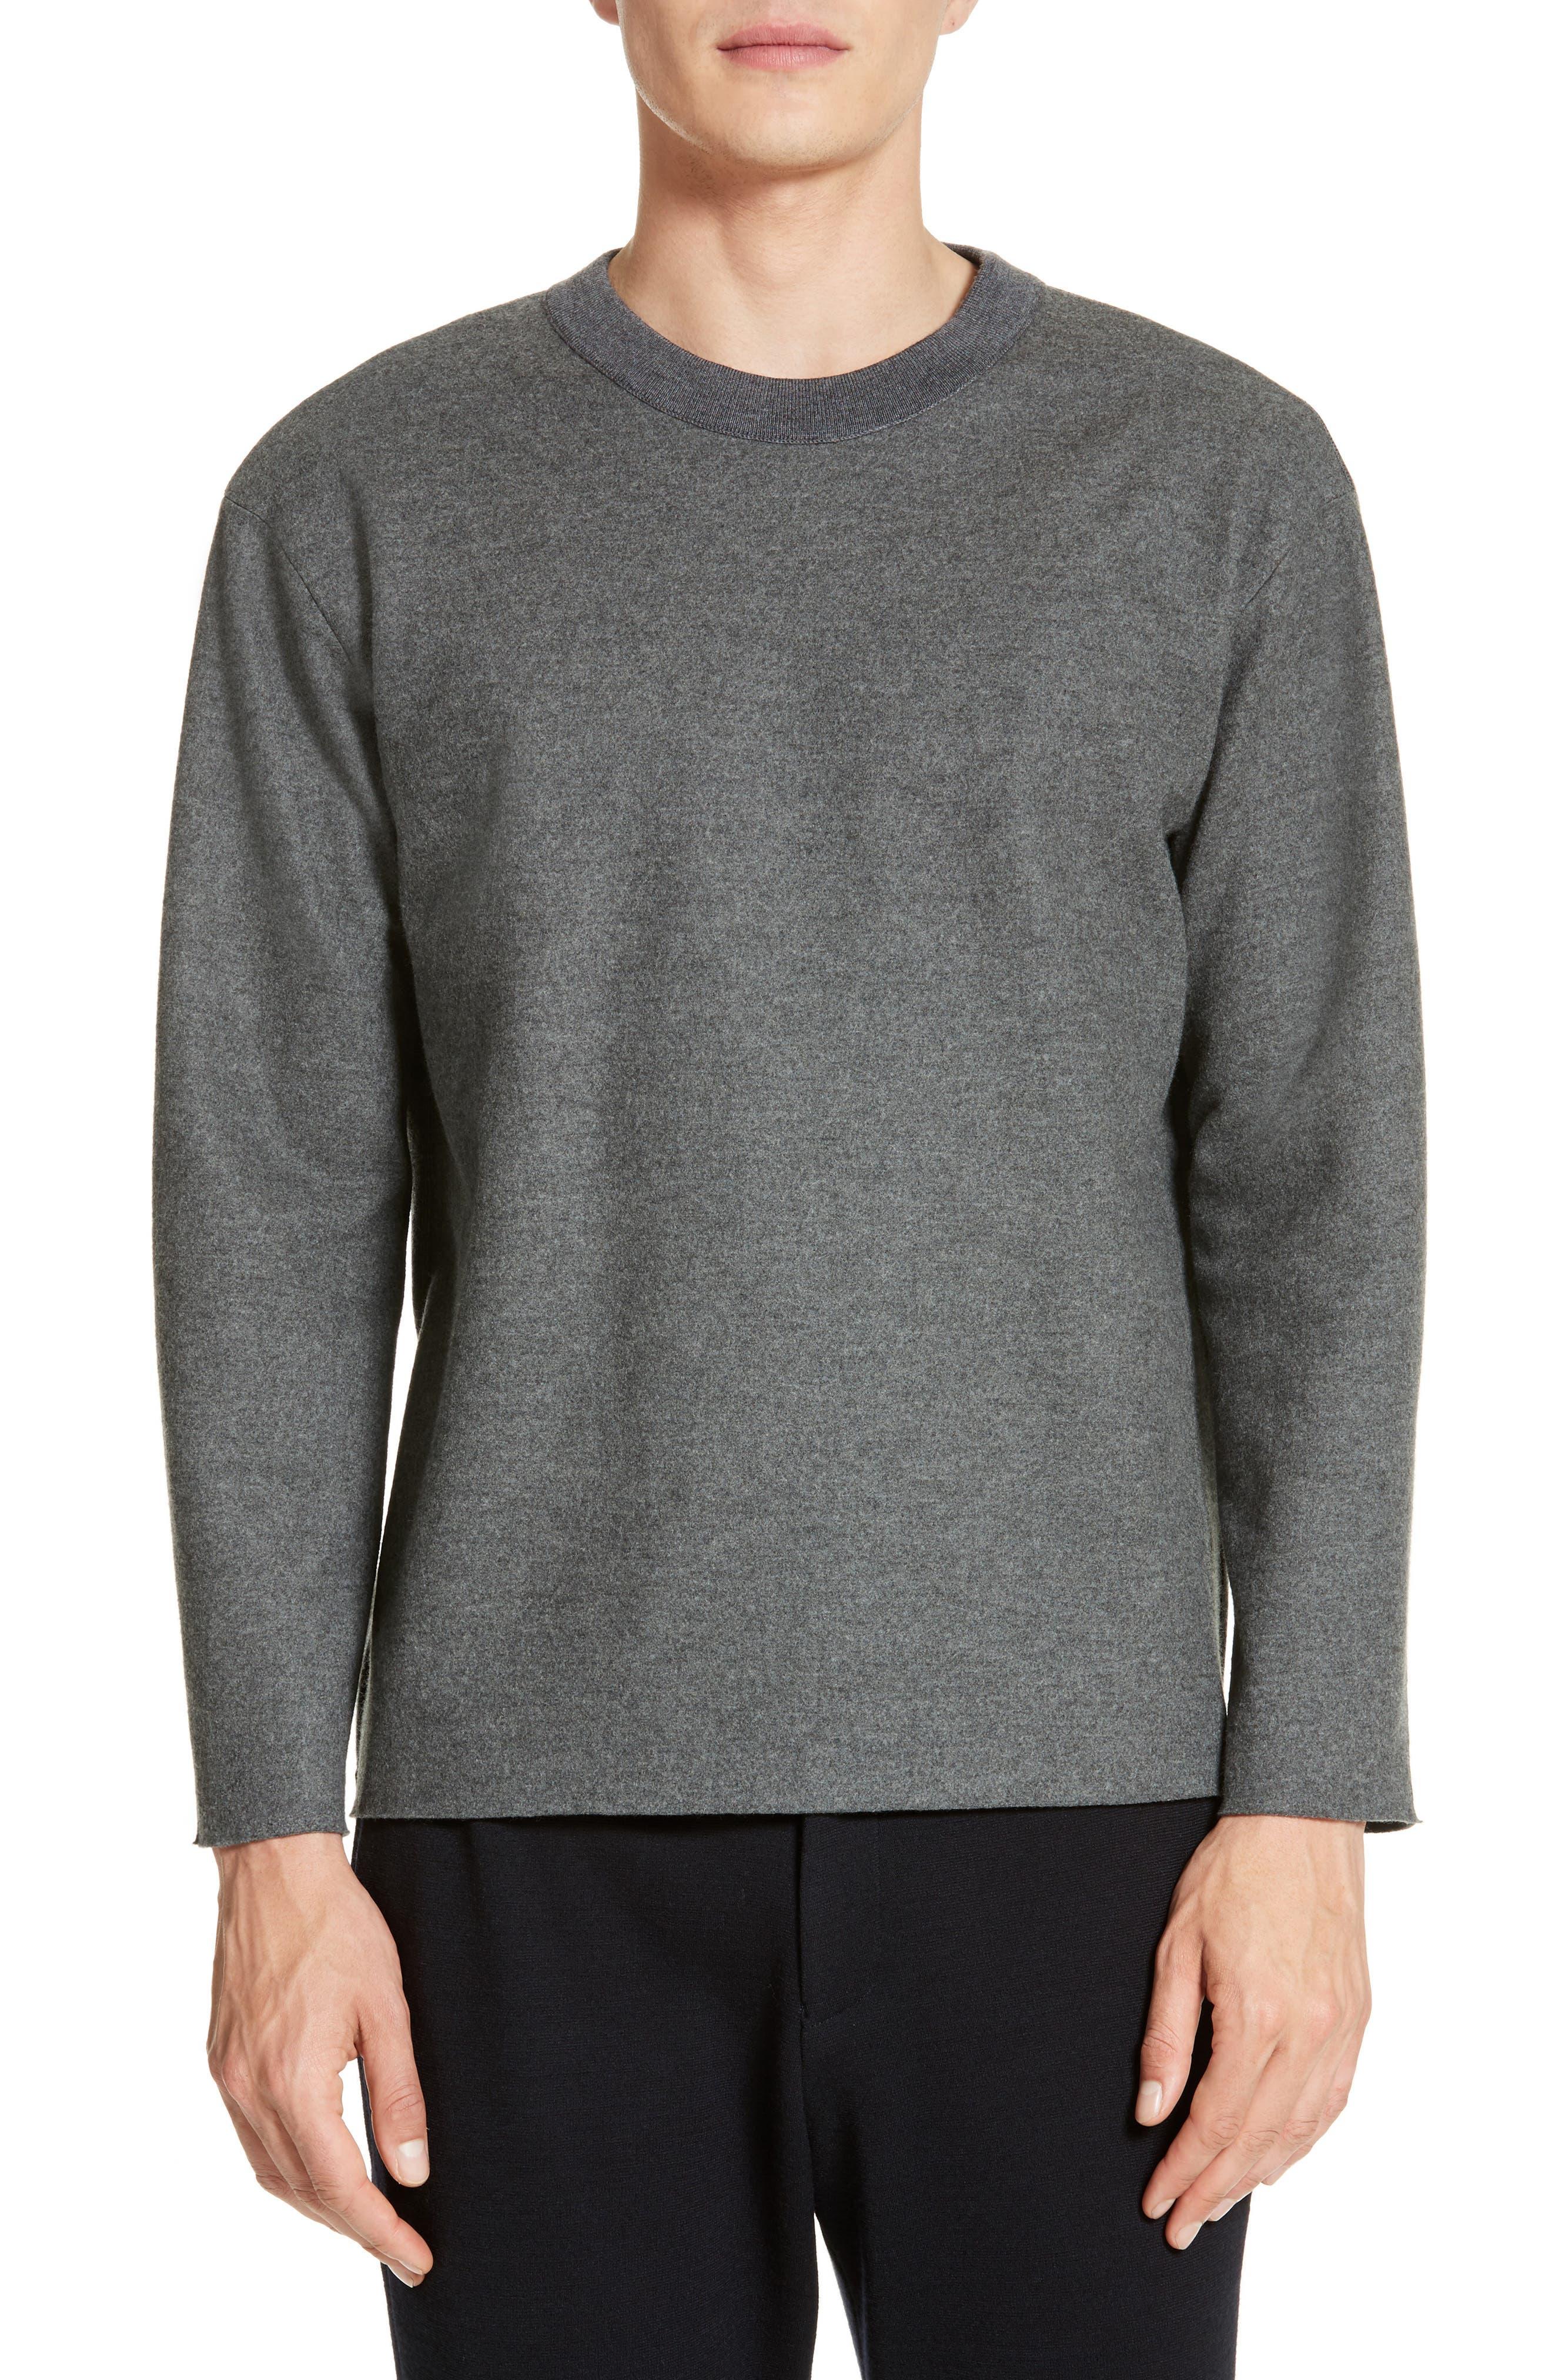 Tomorrowland Hyper Compress Sweatshirt